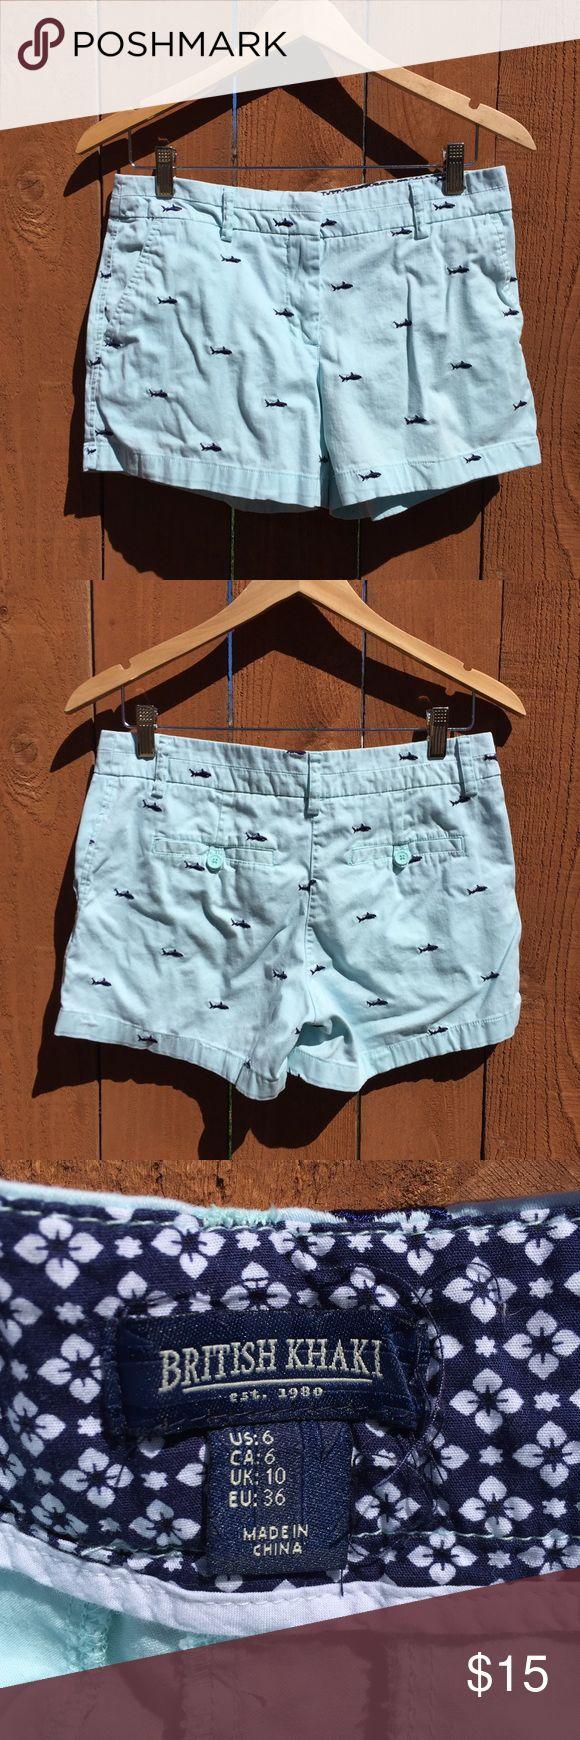 British Khaki shark print shorts blue 6 Gently used. Approximate flat measurements: waist 15in, length 12in, inseam 3.5in, front rise 9in. British Khaki Shorts